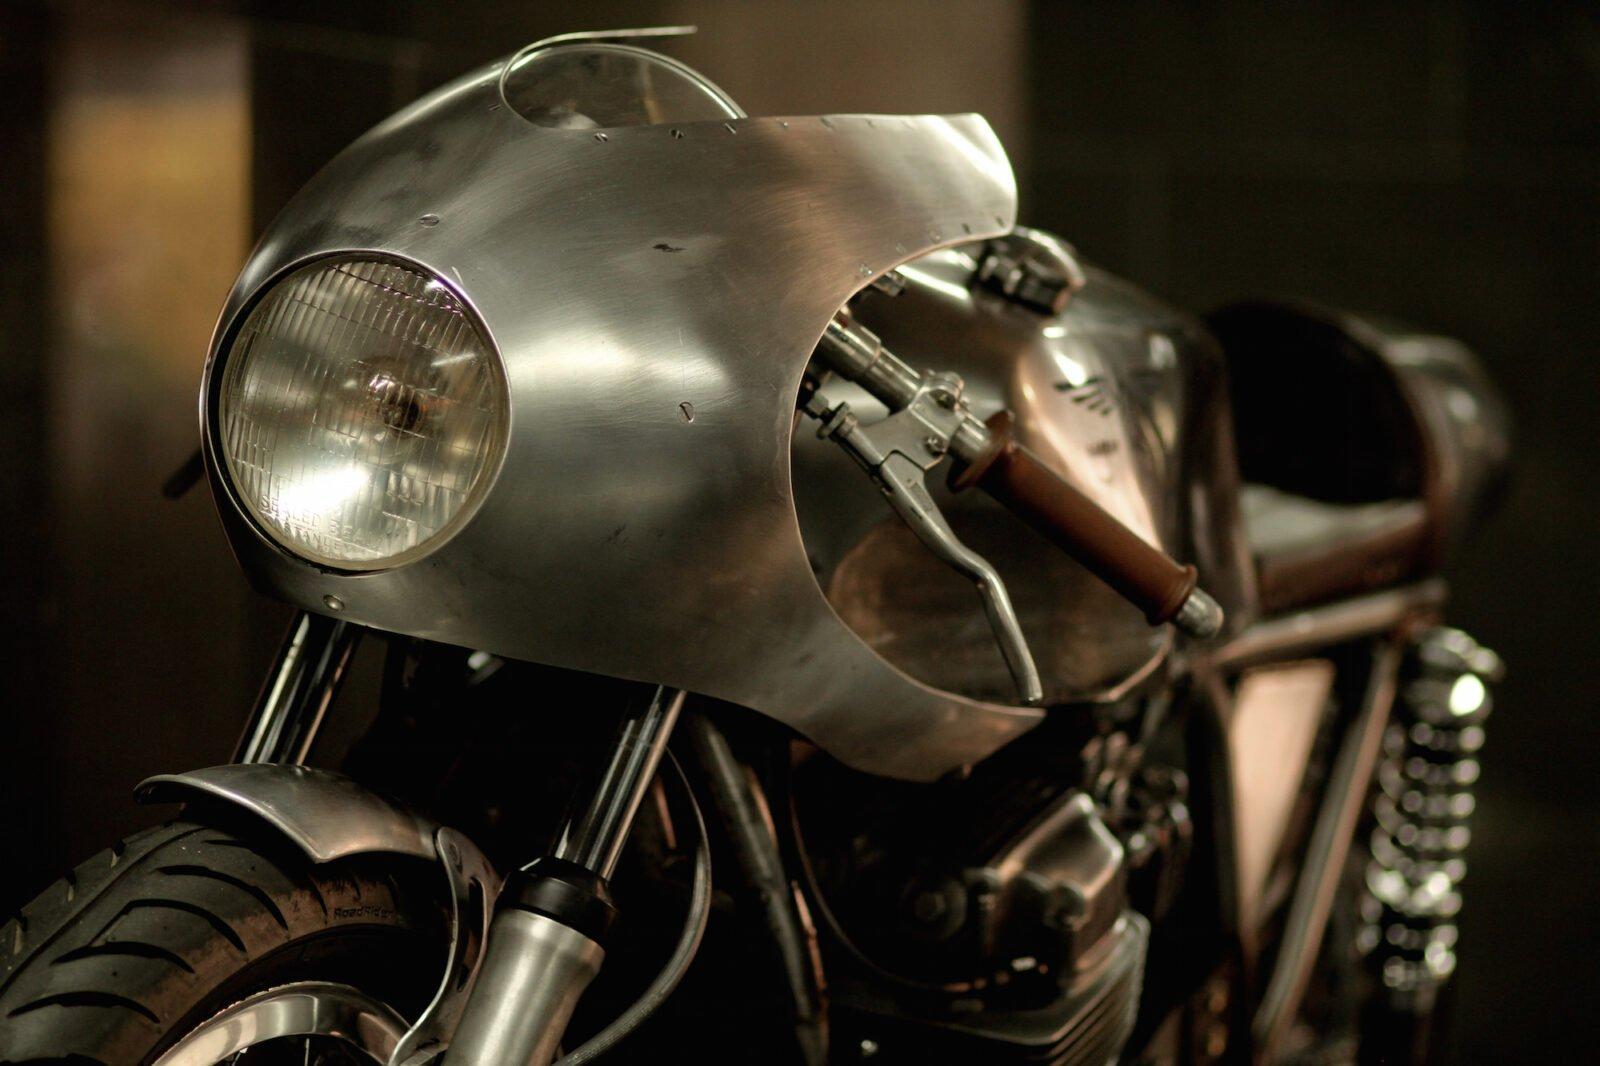 Honda CB 750 Motorcycle 6 1600x1066 - Ryan Reynolds' Honda CB750 by Raccia Motorcycles